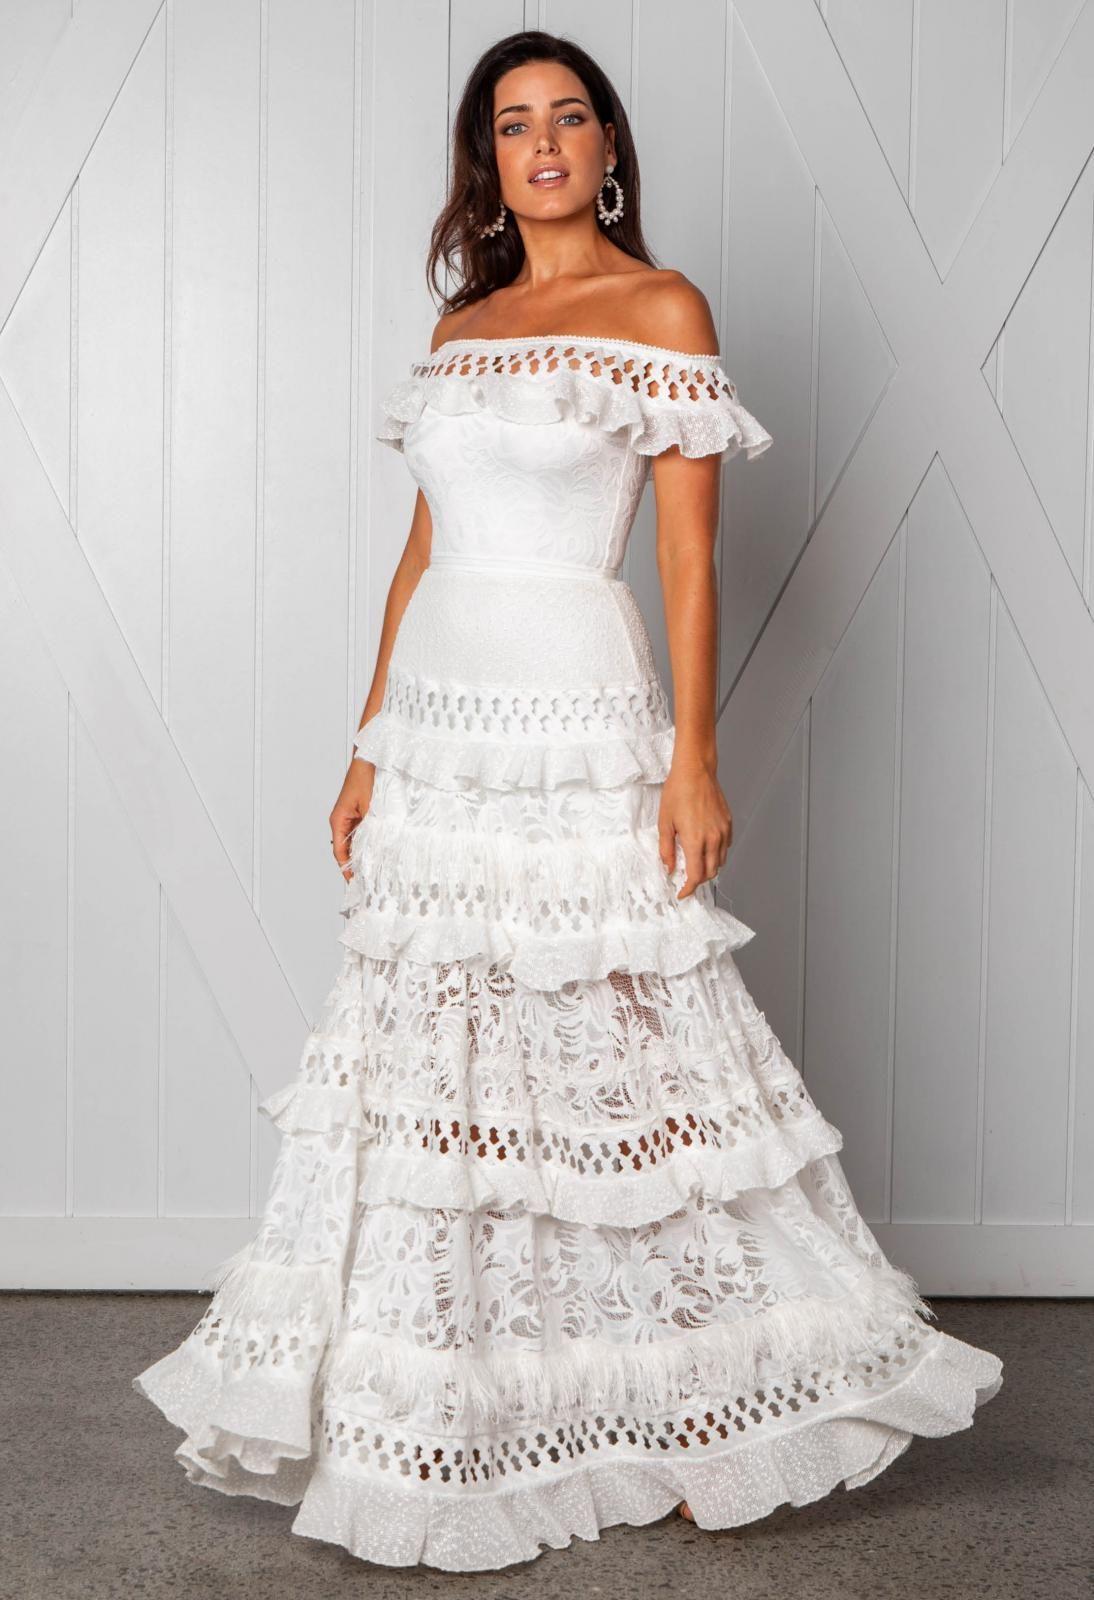 Coco weddingfuneasy ideas pinterest wedding dress wedding